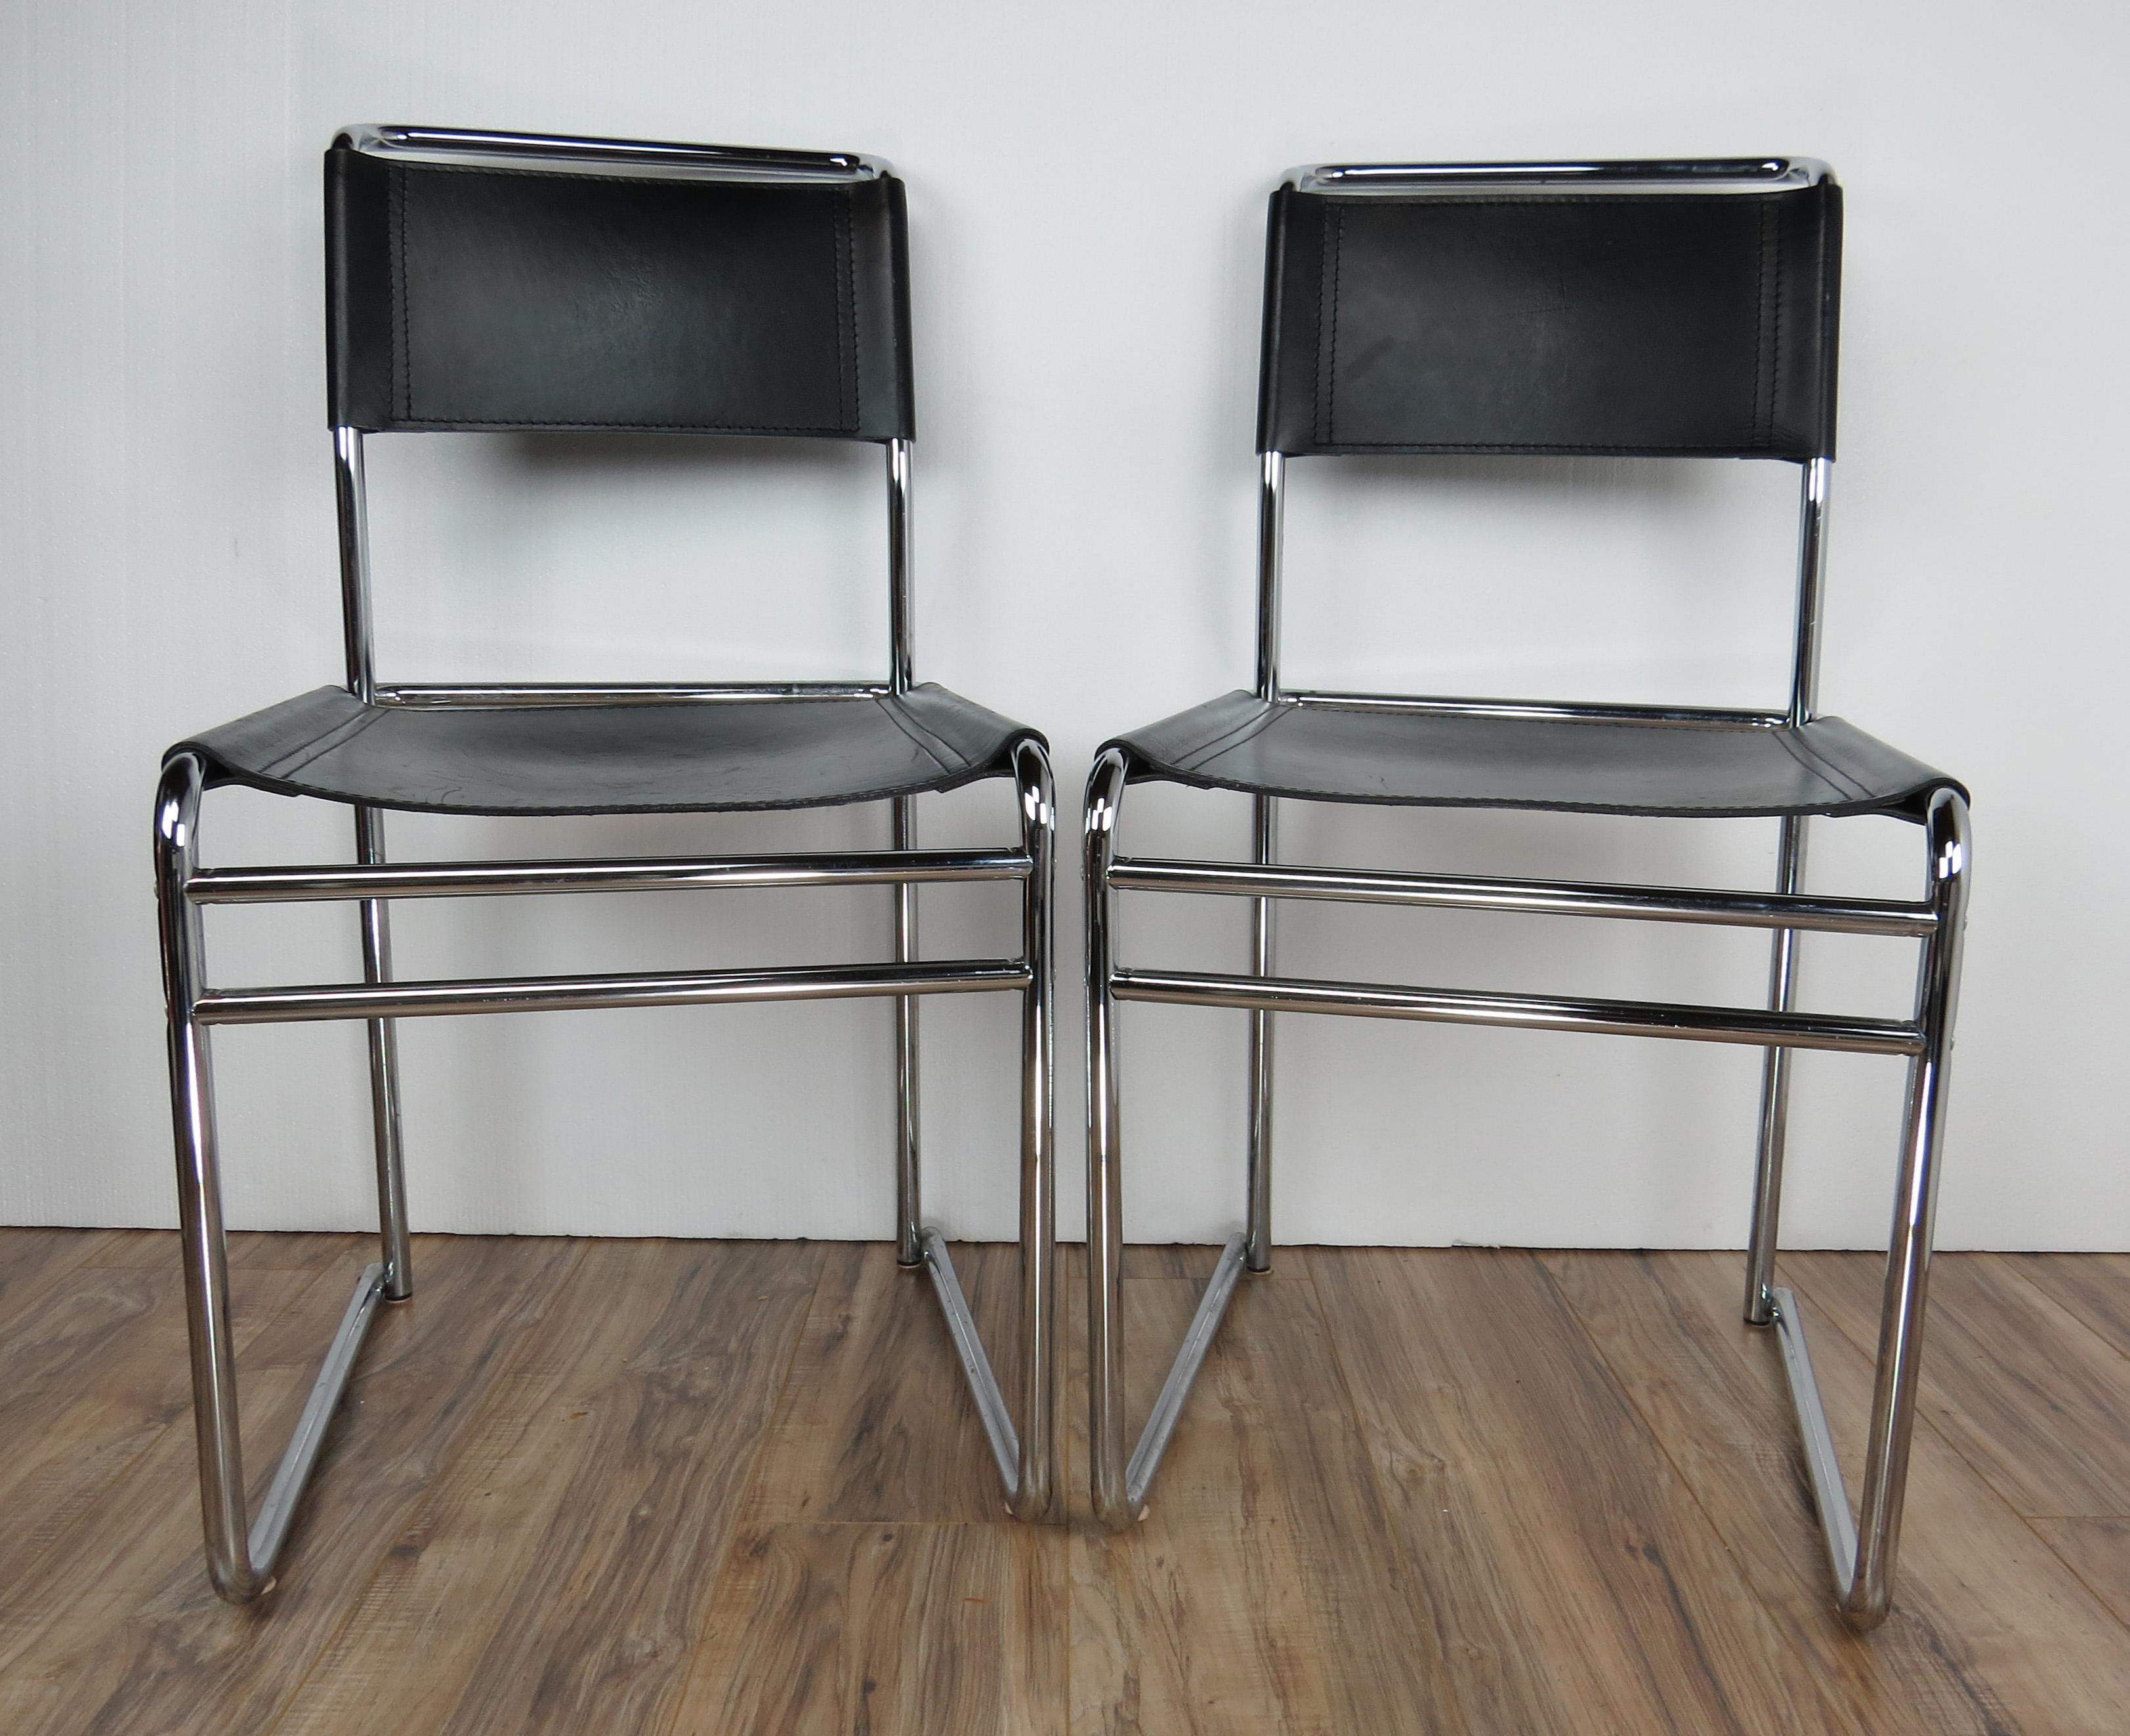 Marcel Breuer Vintage Mid Century Bauhaus Designer and Architect Marcel Breuer B5 Chairs - Set of  sc 1 st  Chairish & Vintage Mid Century Bauhaus Designer and Architect Marcel Breuer B5 ...